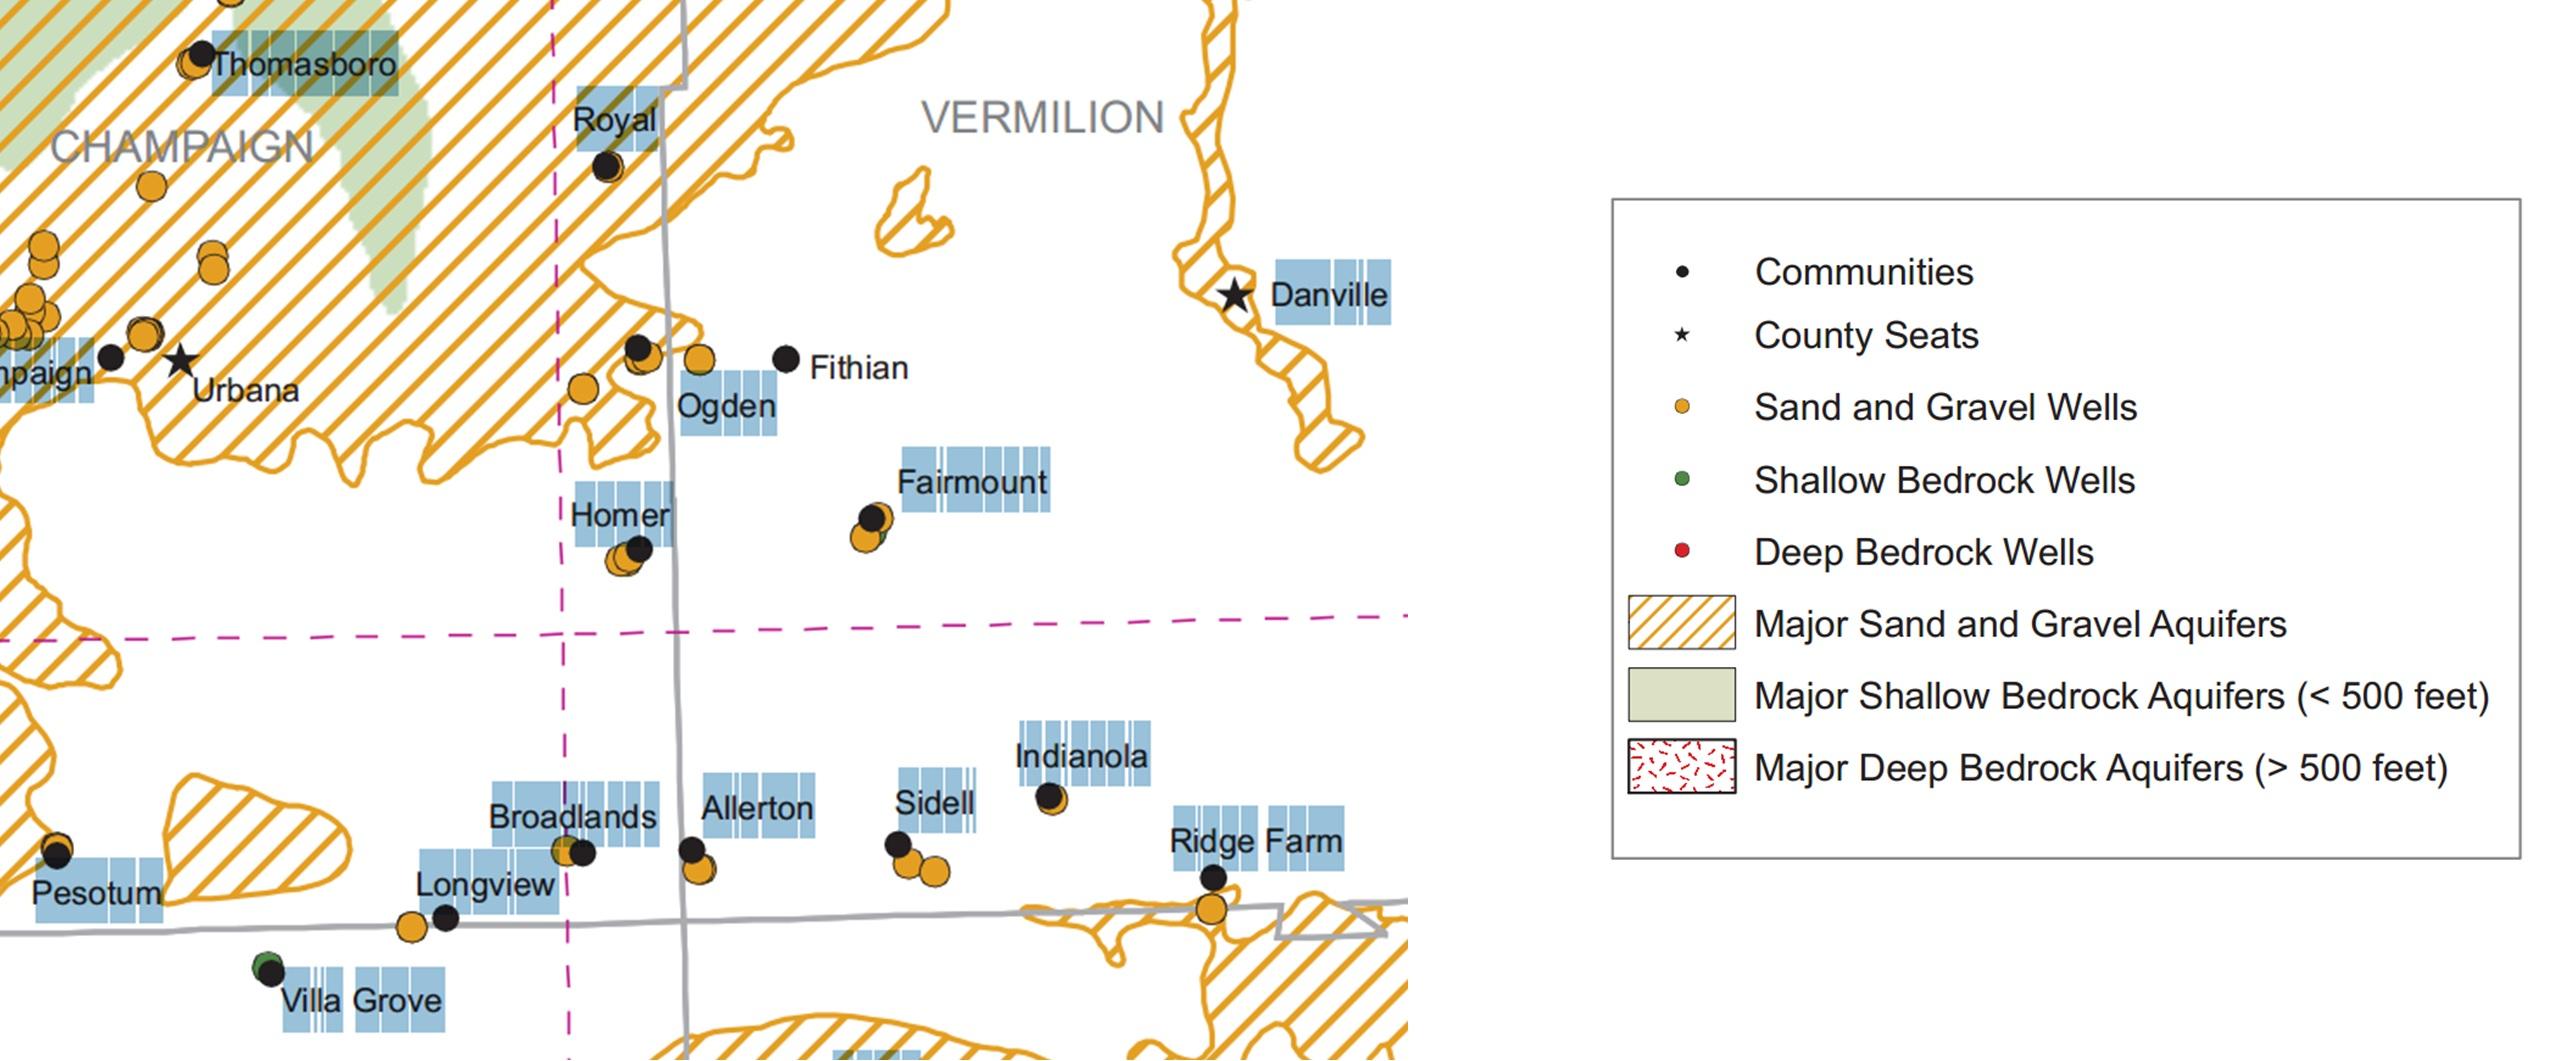 Illinois vermilion county fairmount - Vermilion County Groundwater Availability